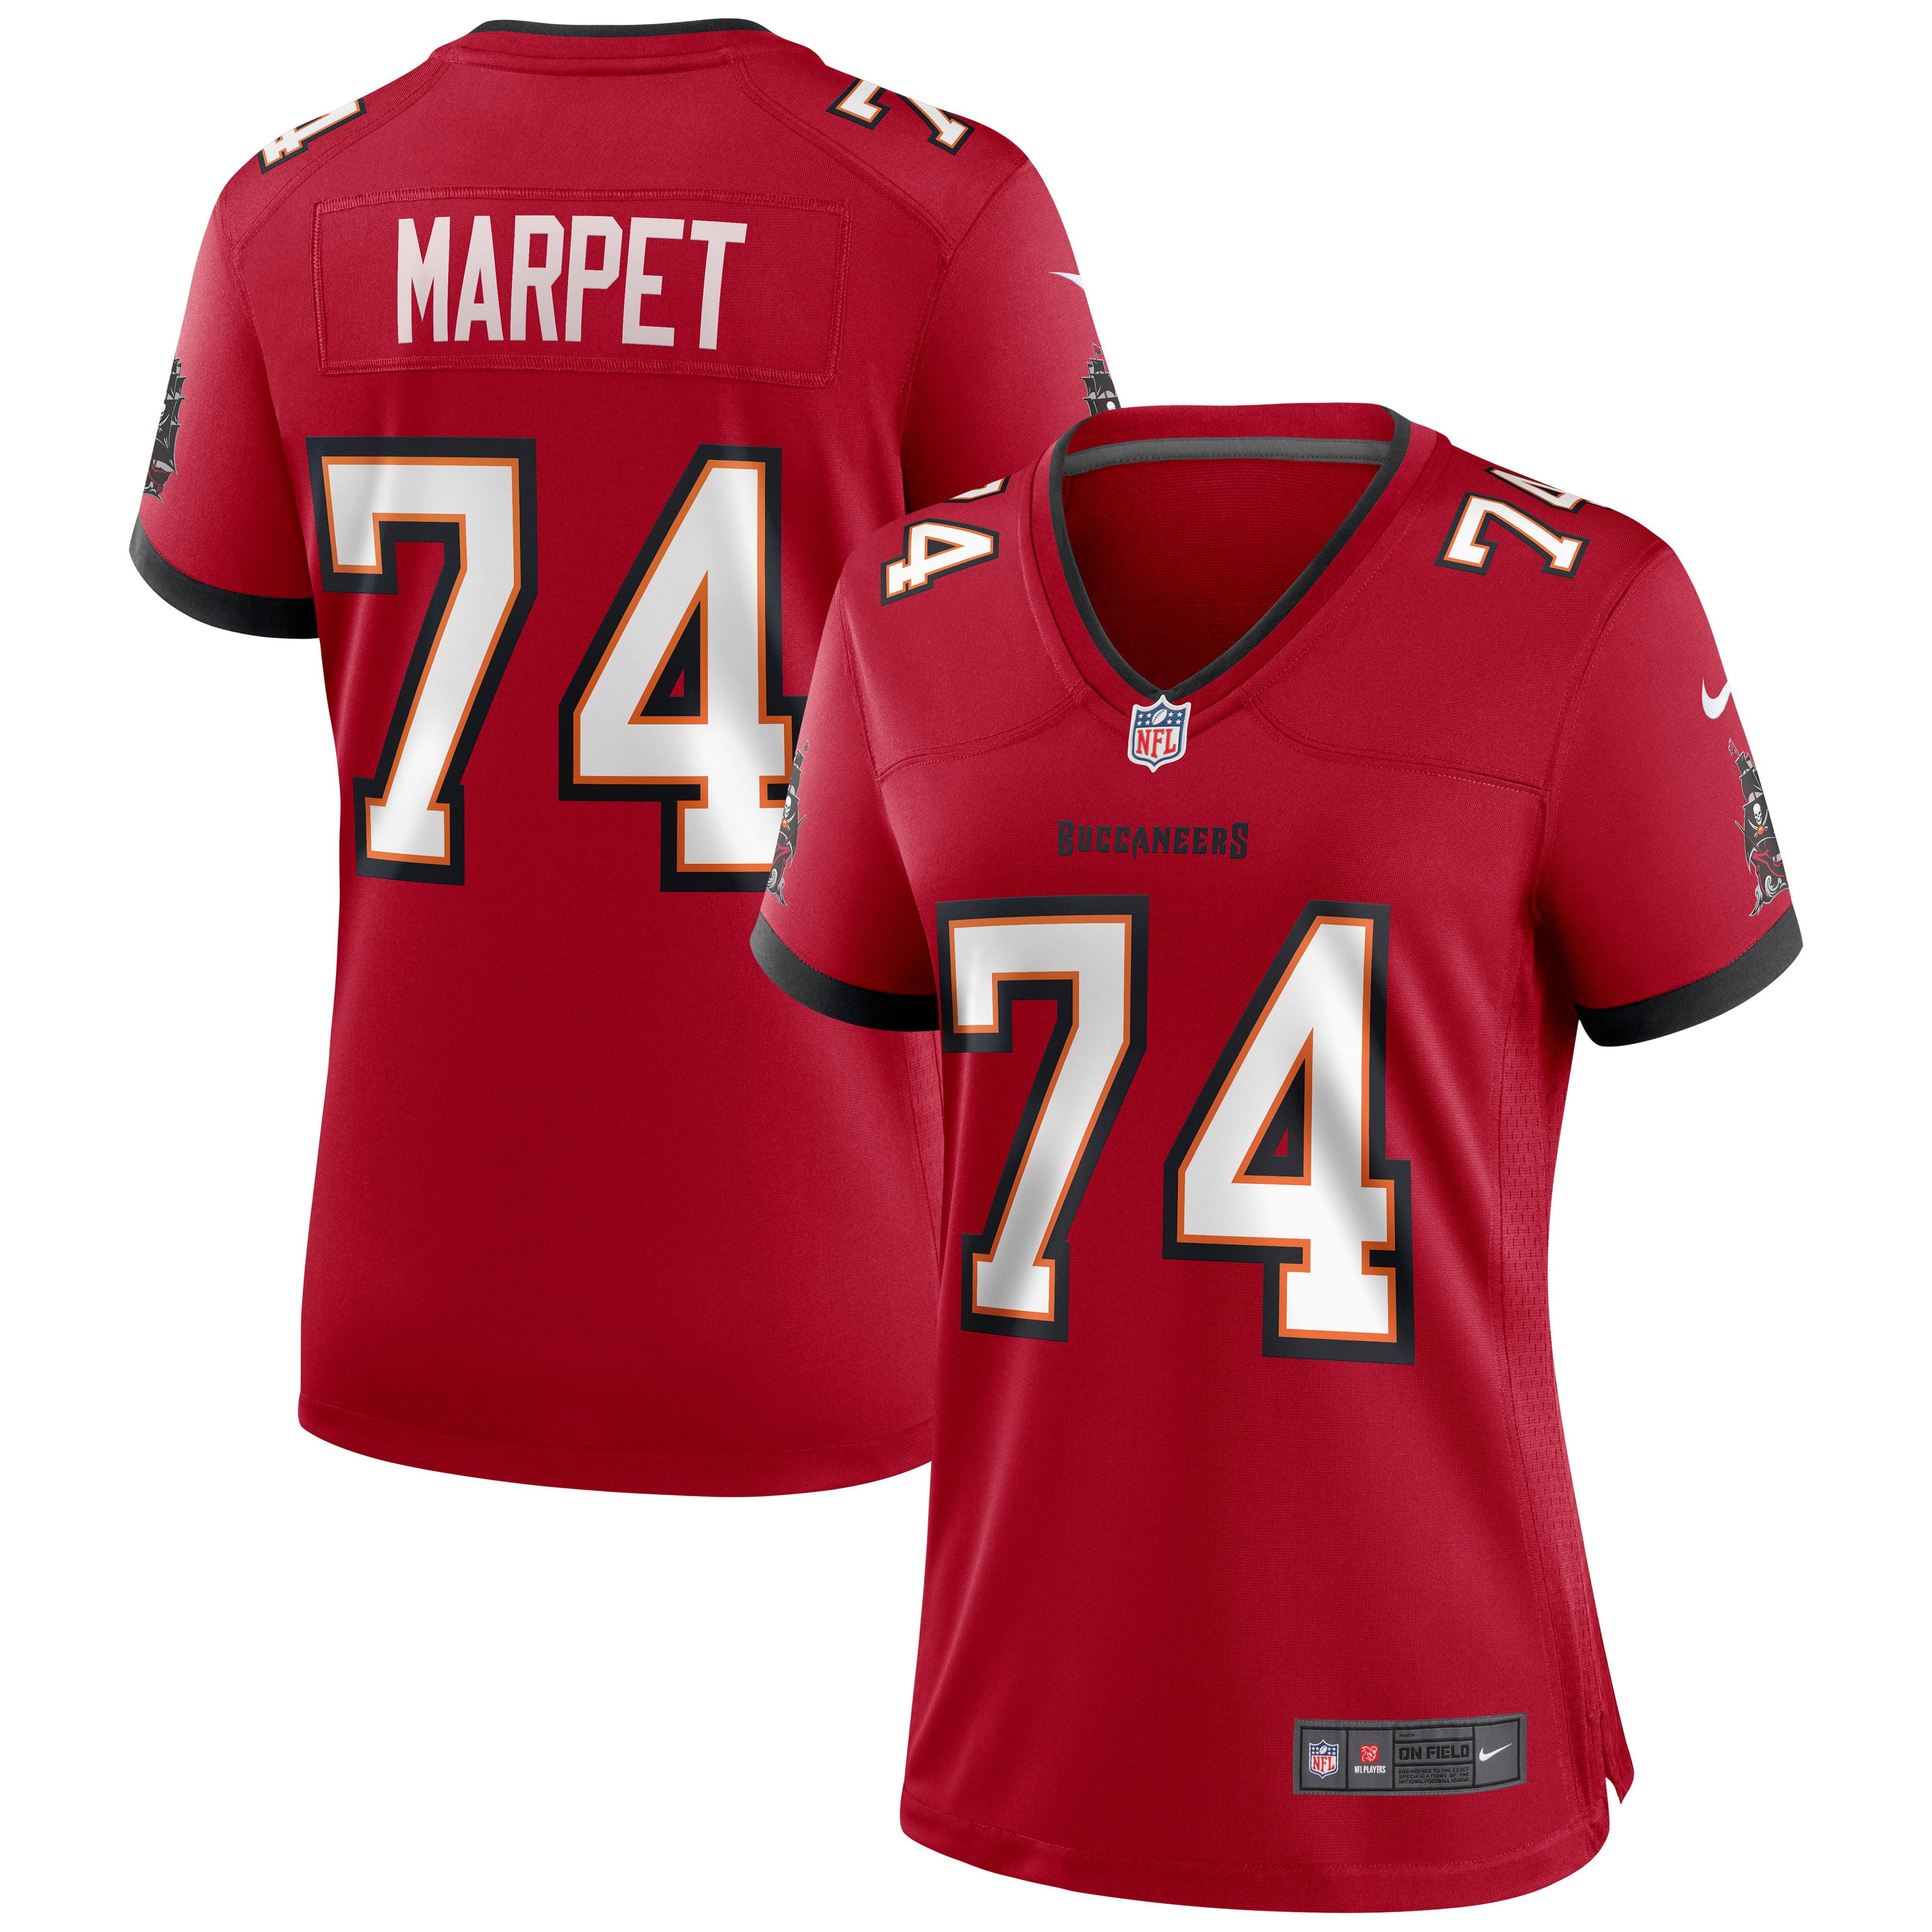 Ali Marpet Tampa Bay Buccaneers Nike Women's Game Jersey - Red - Walmart.com